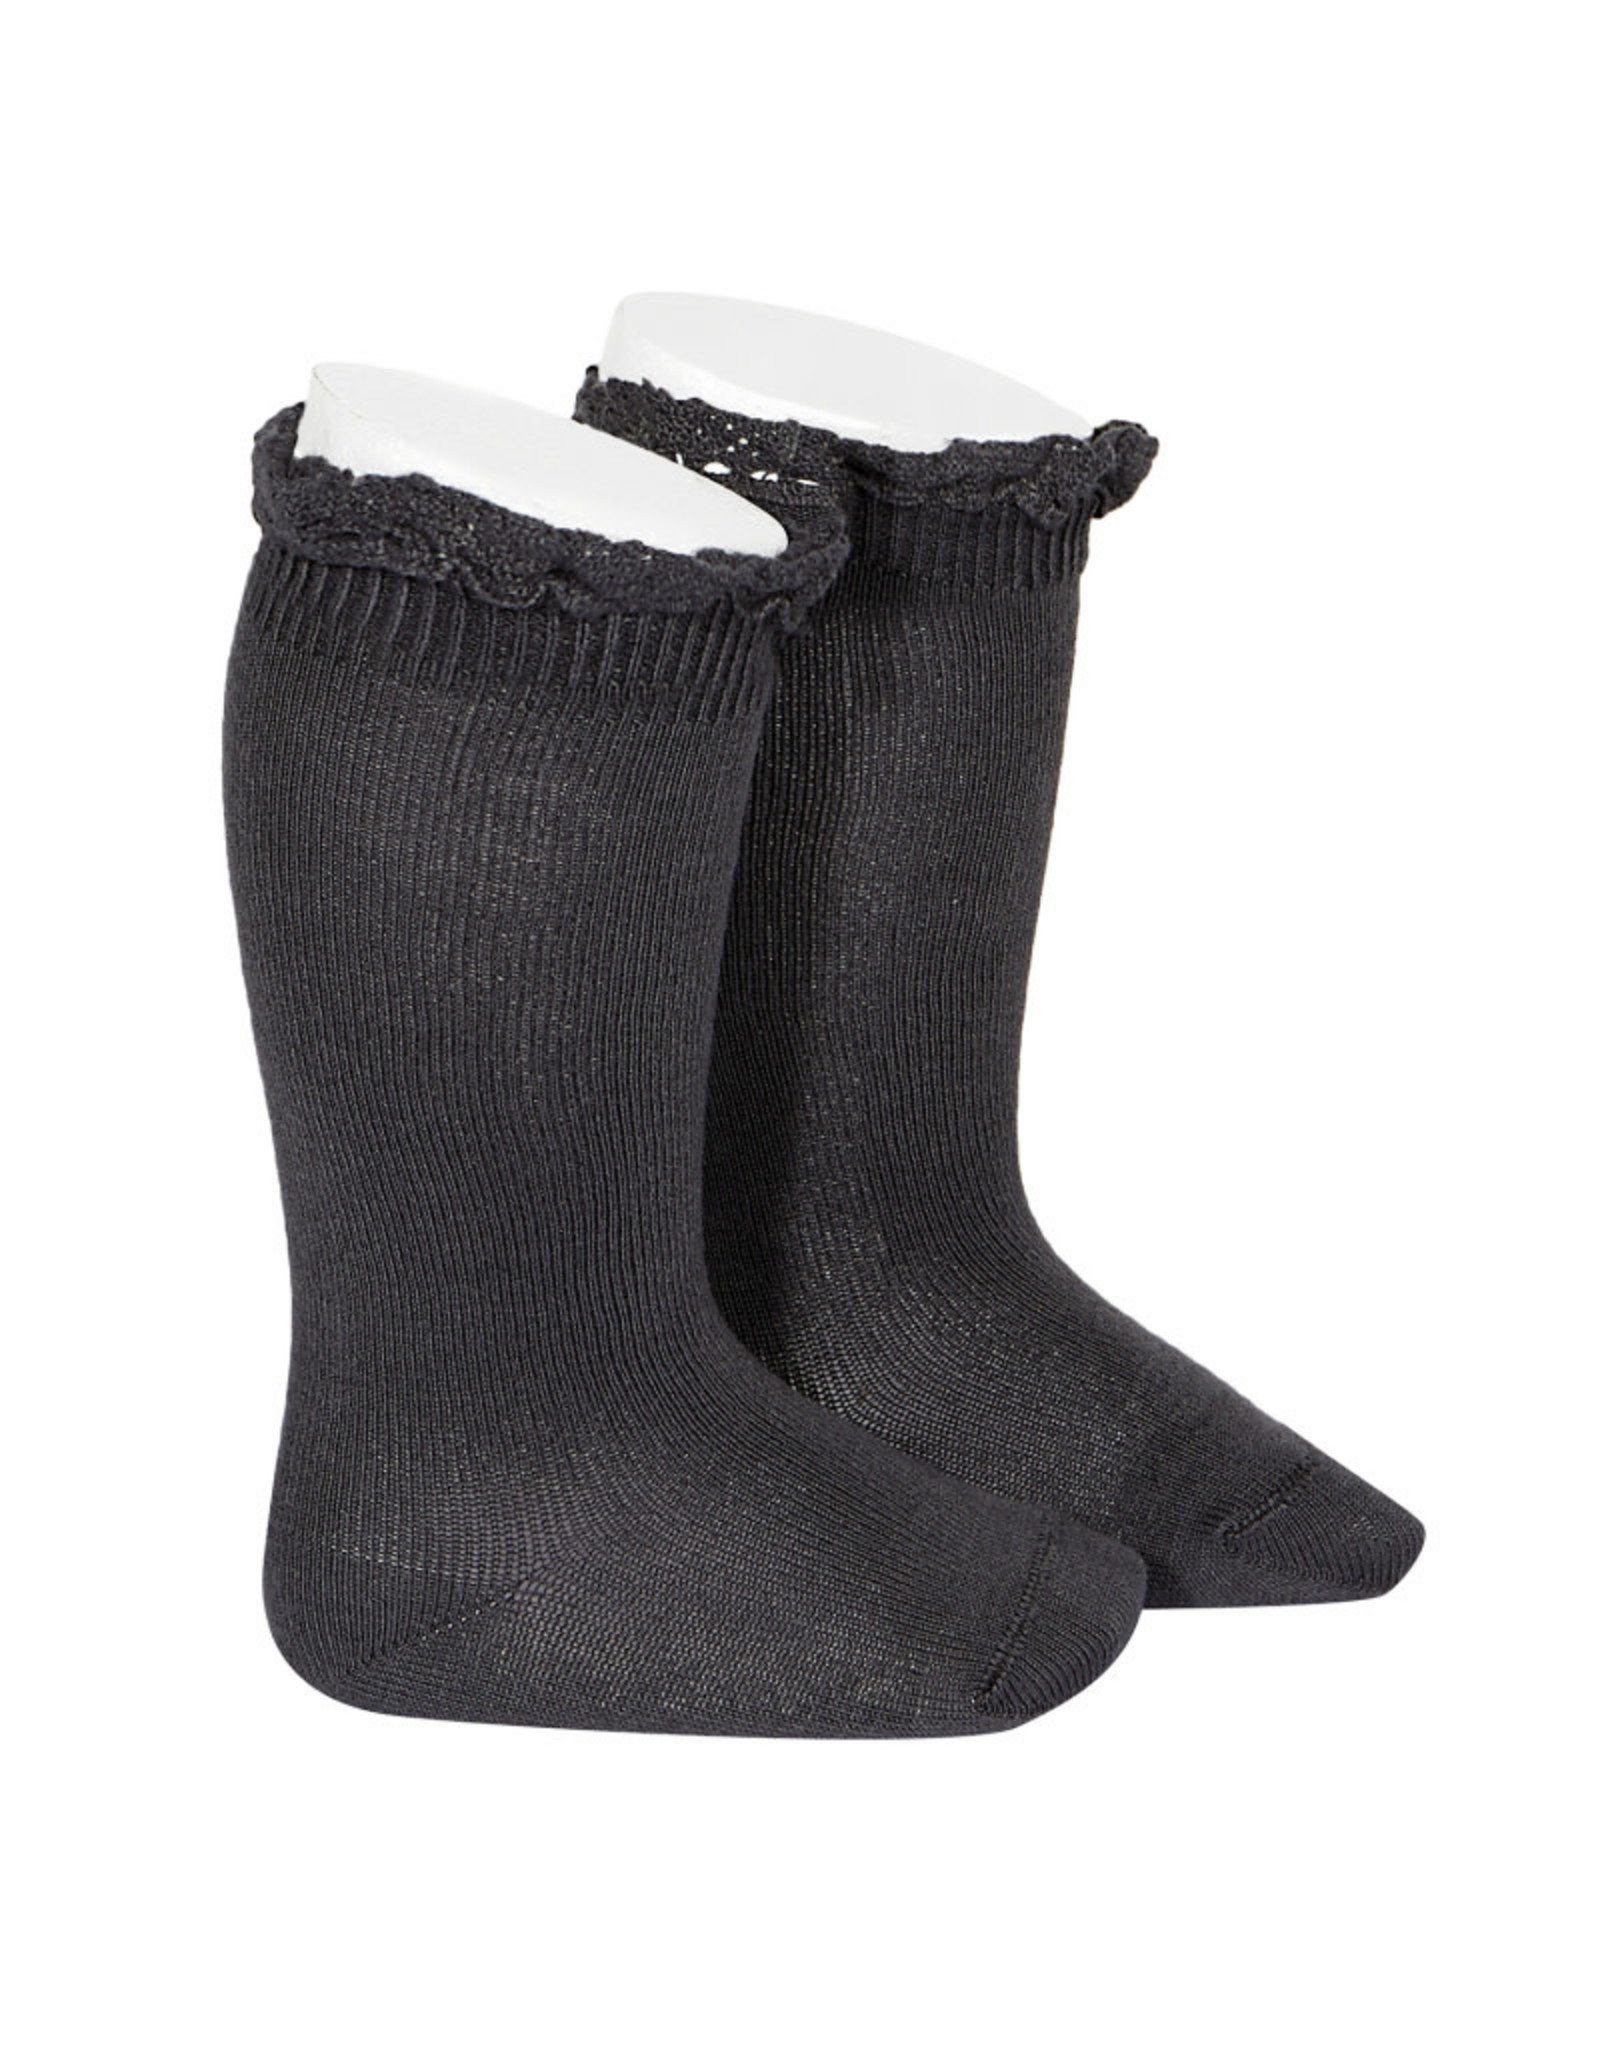 CONDOR Coal Lace Edging Knee Socks